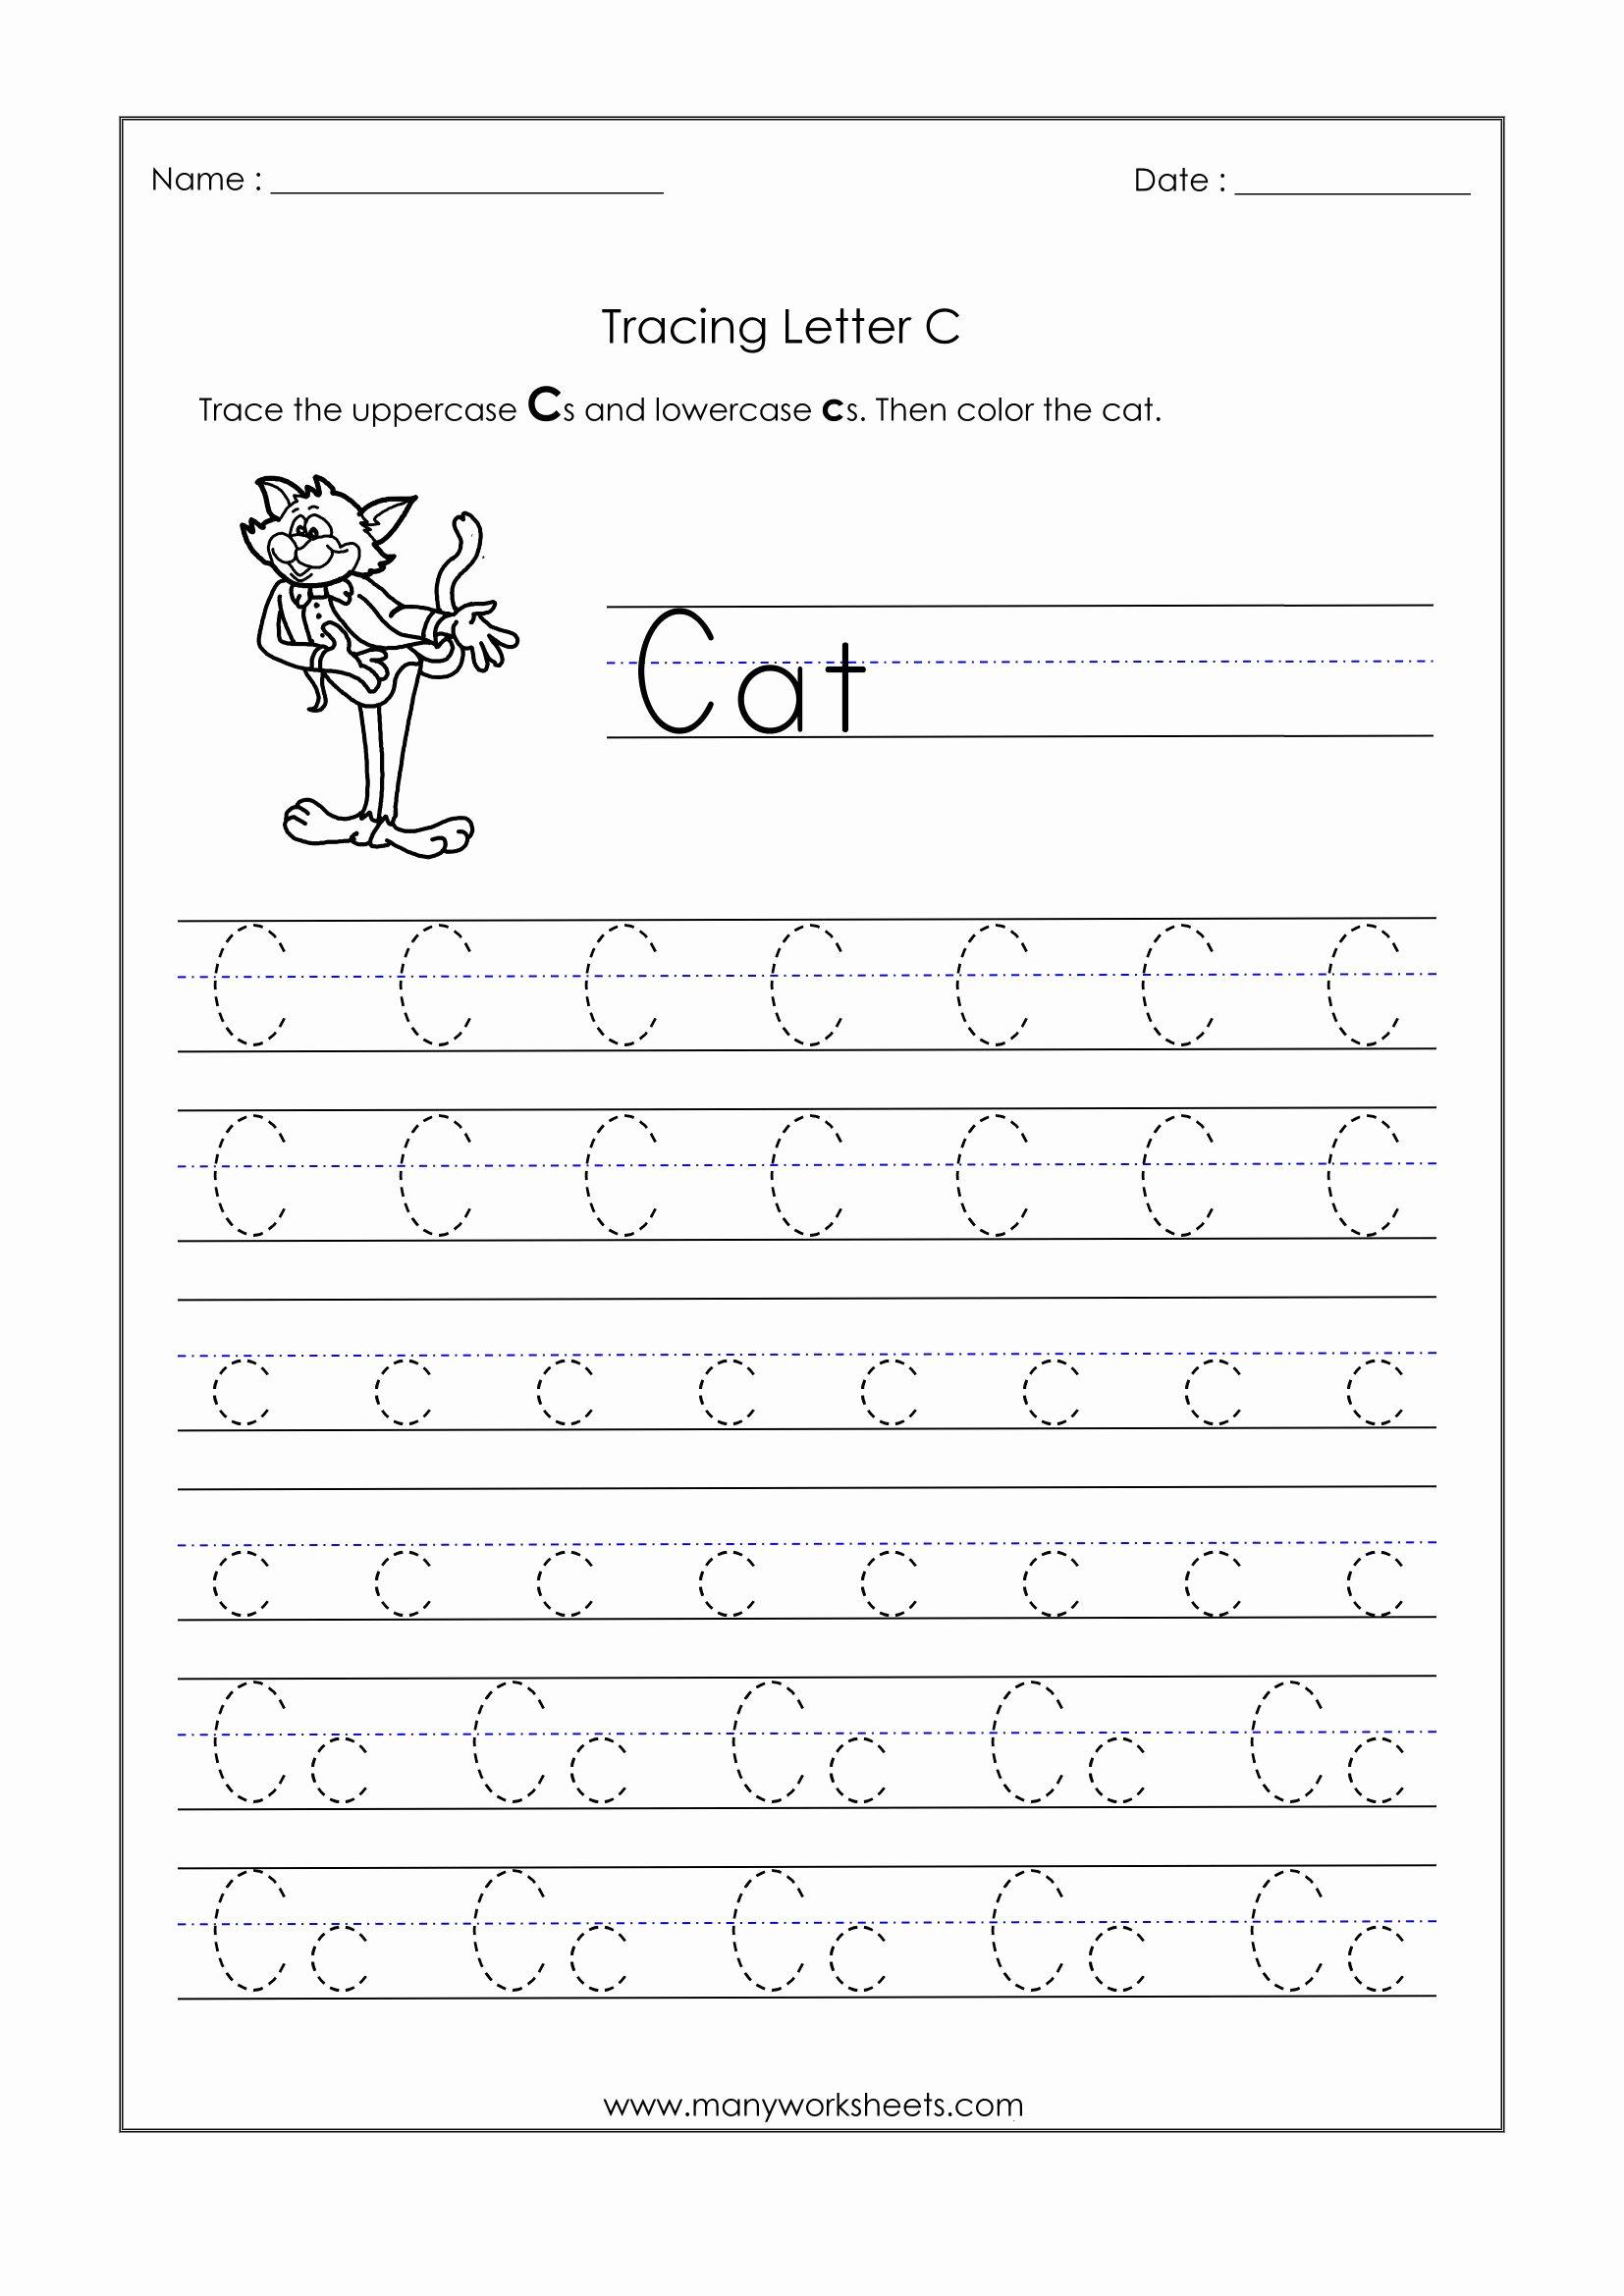 Letter C Tracing Worksheets for Preschoolers Fresh Letter Worksheets for Kindergarten Trace Dotted Letters